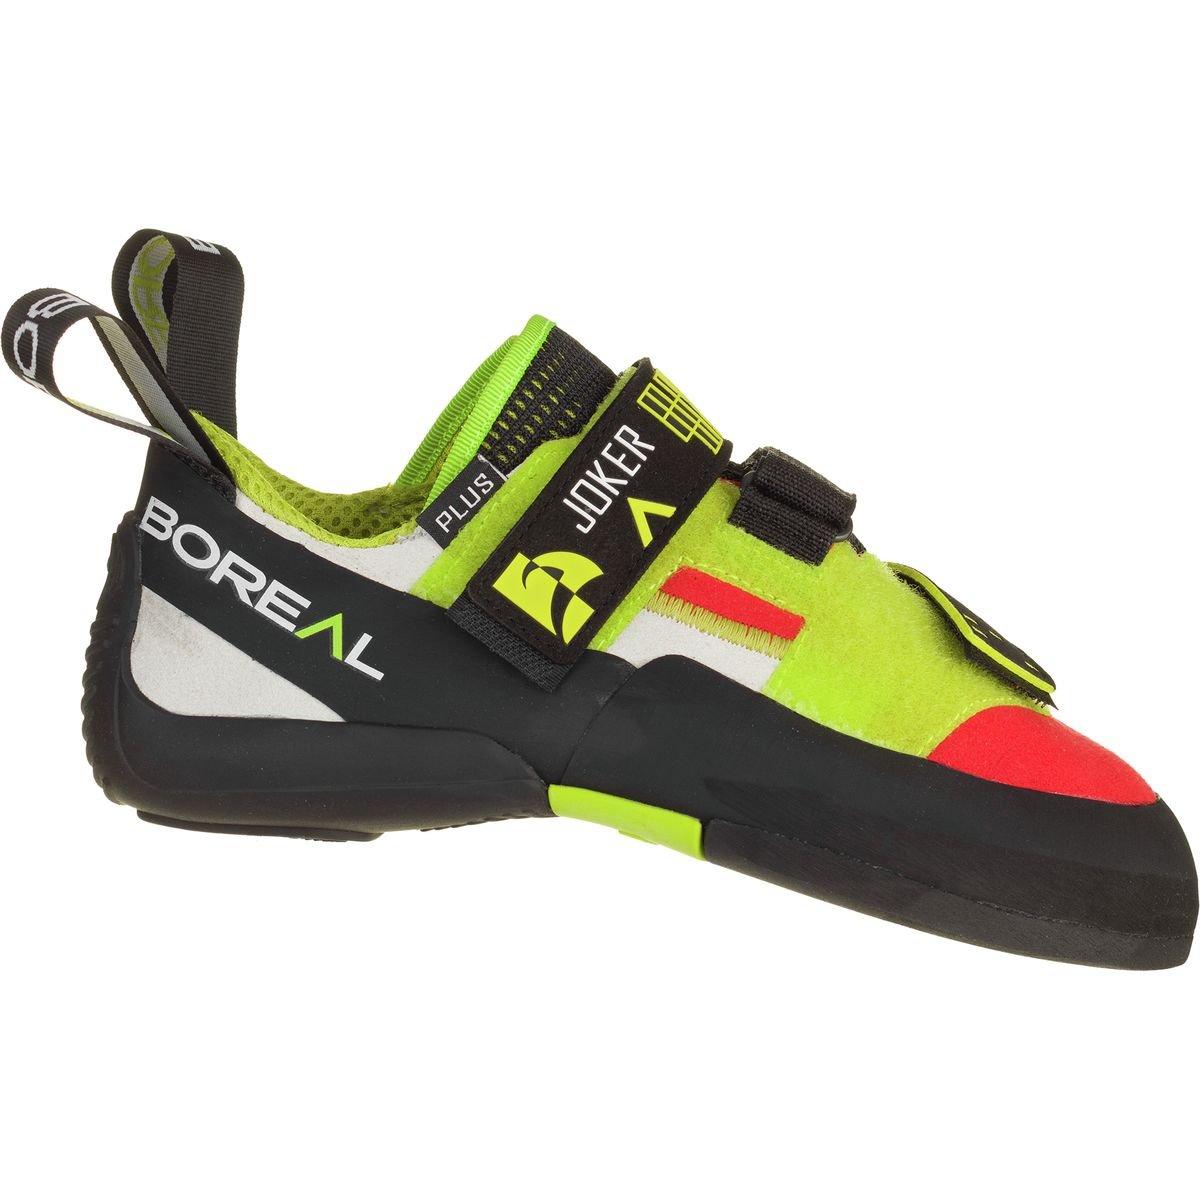 Boreal Climbing Shoes Womens Joker Plus 5 Black Orange Yellow 11386 by Boreal